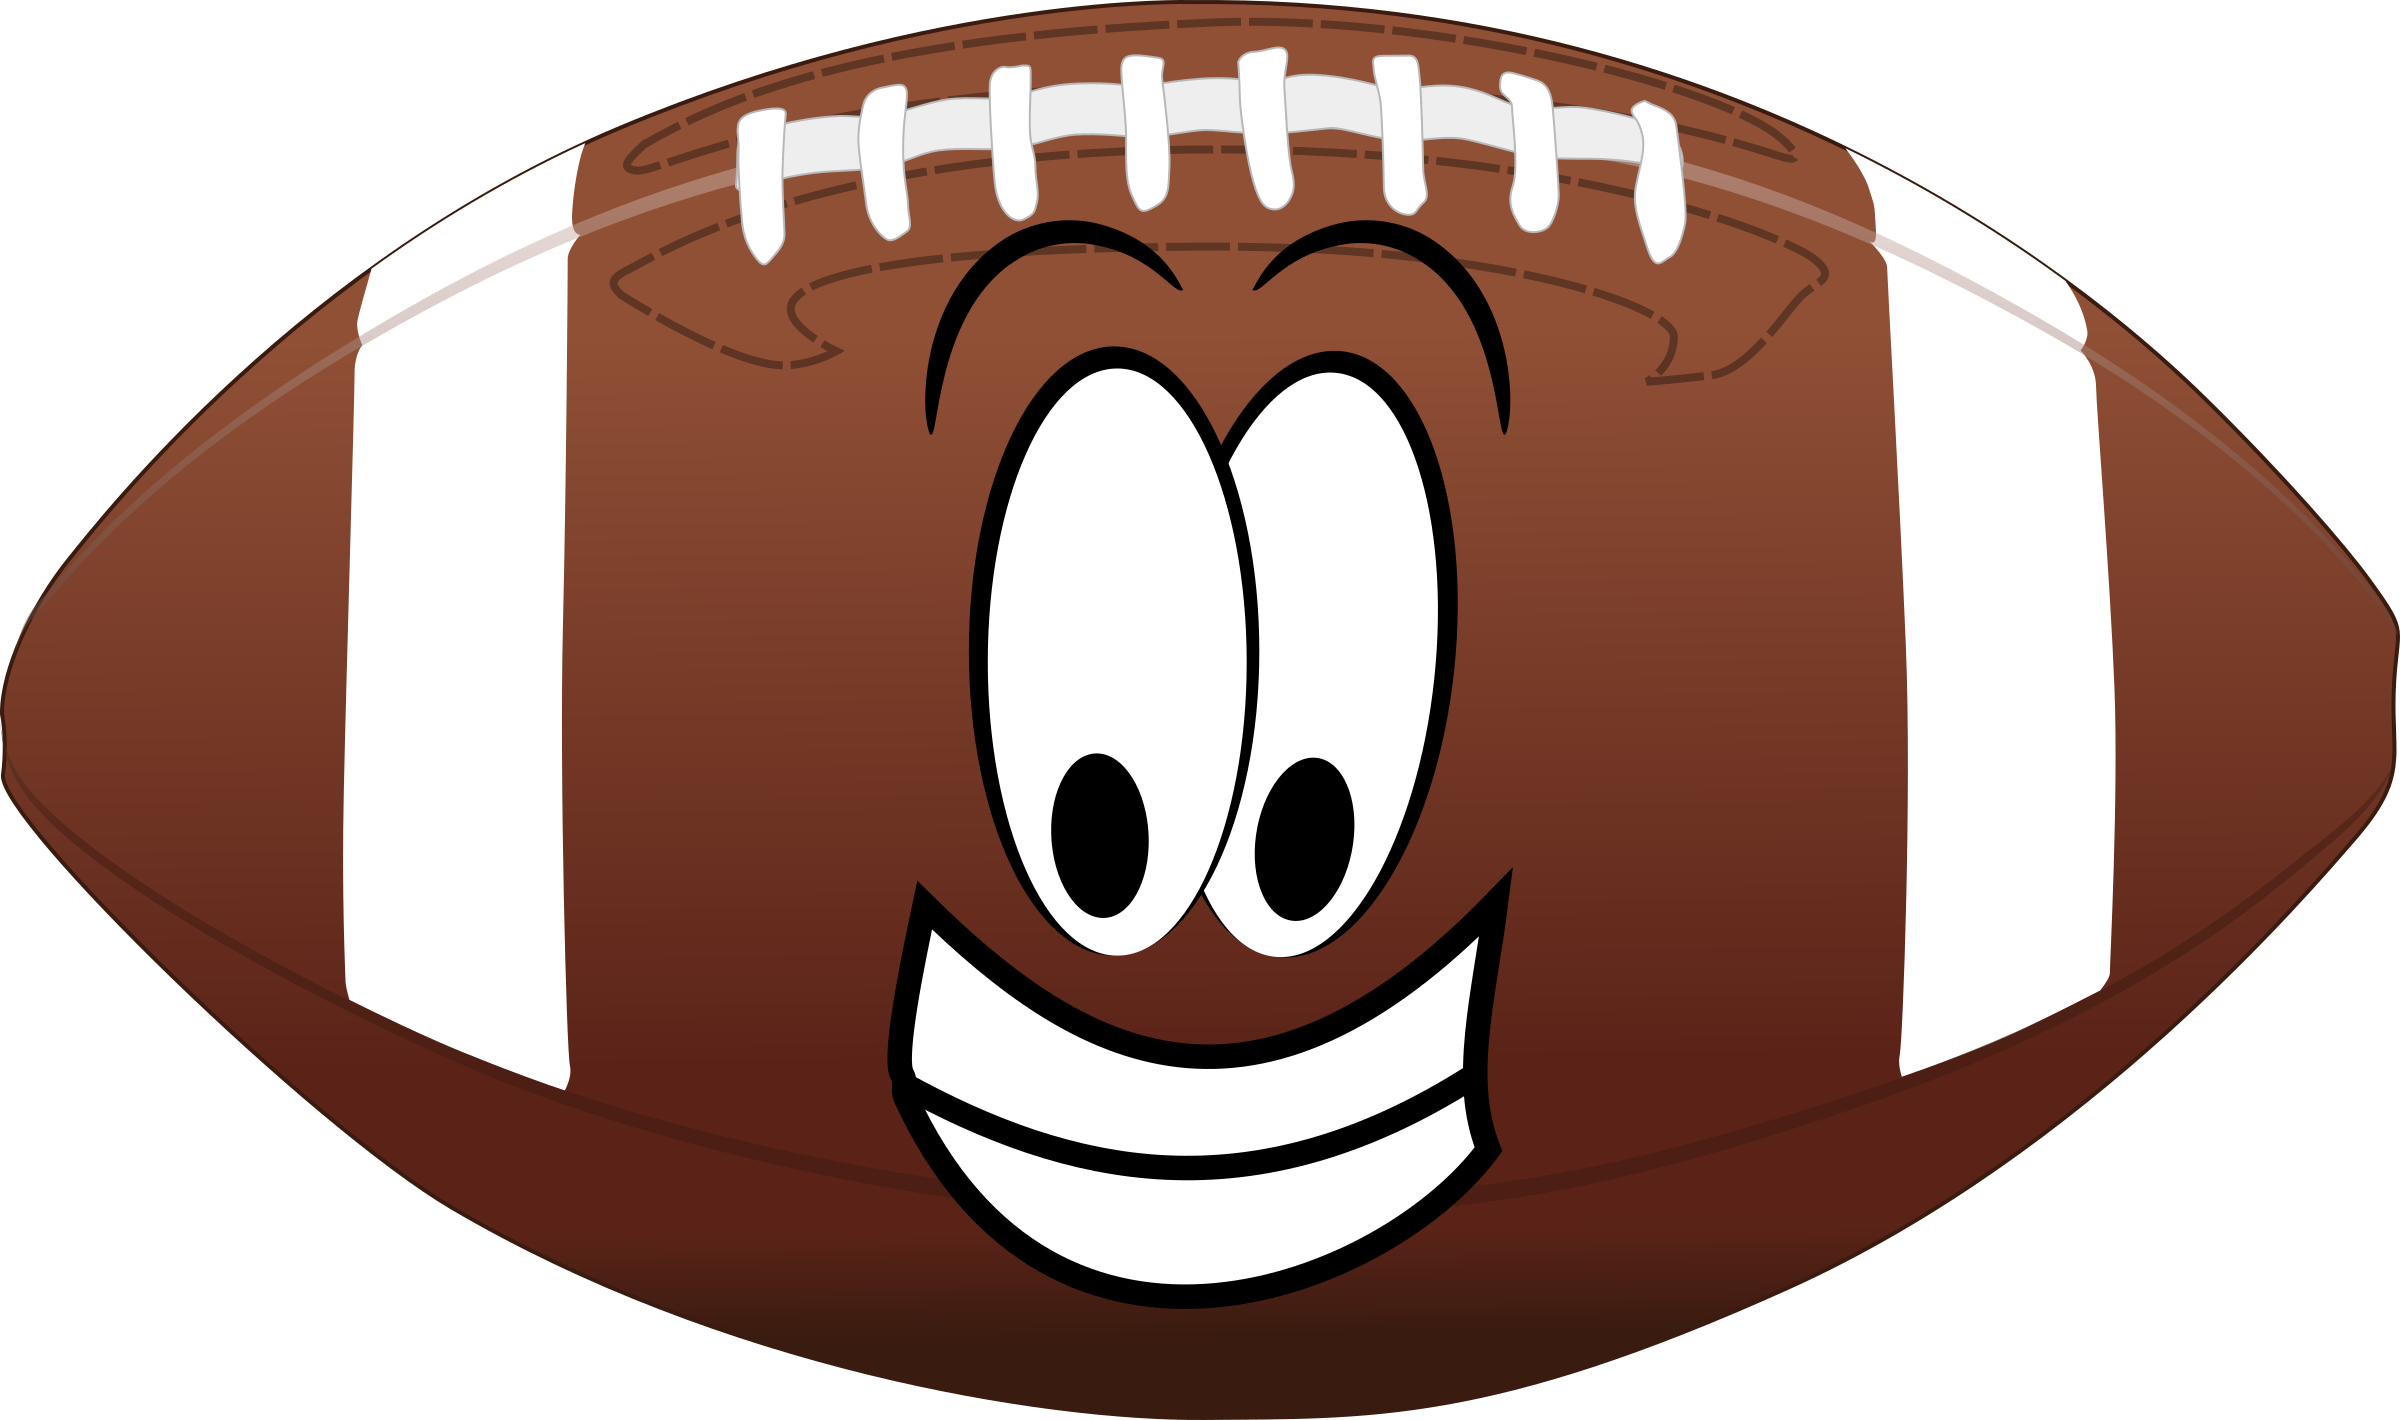 I frames illustrations hd. Football clipart alabama